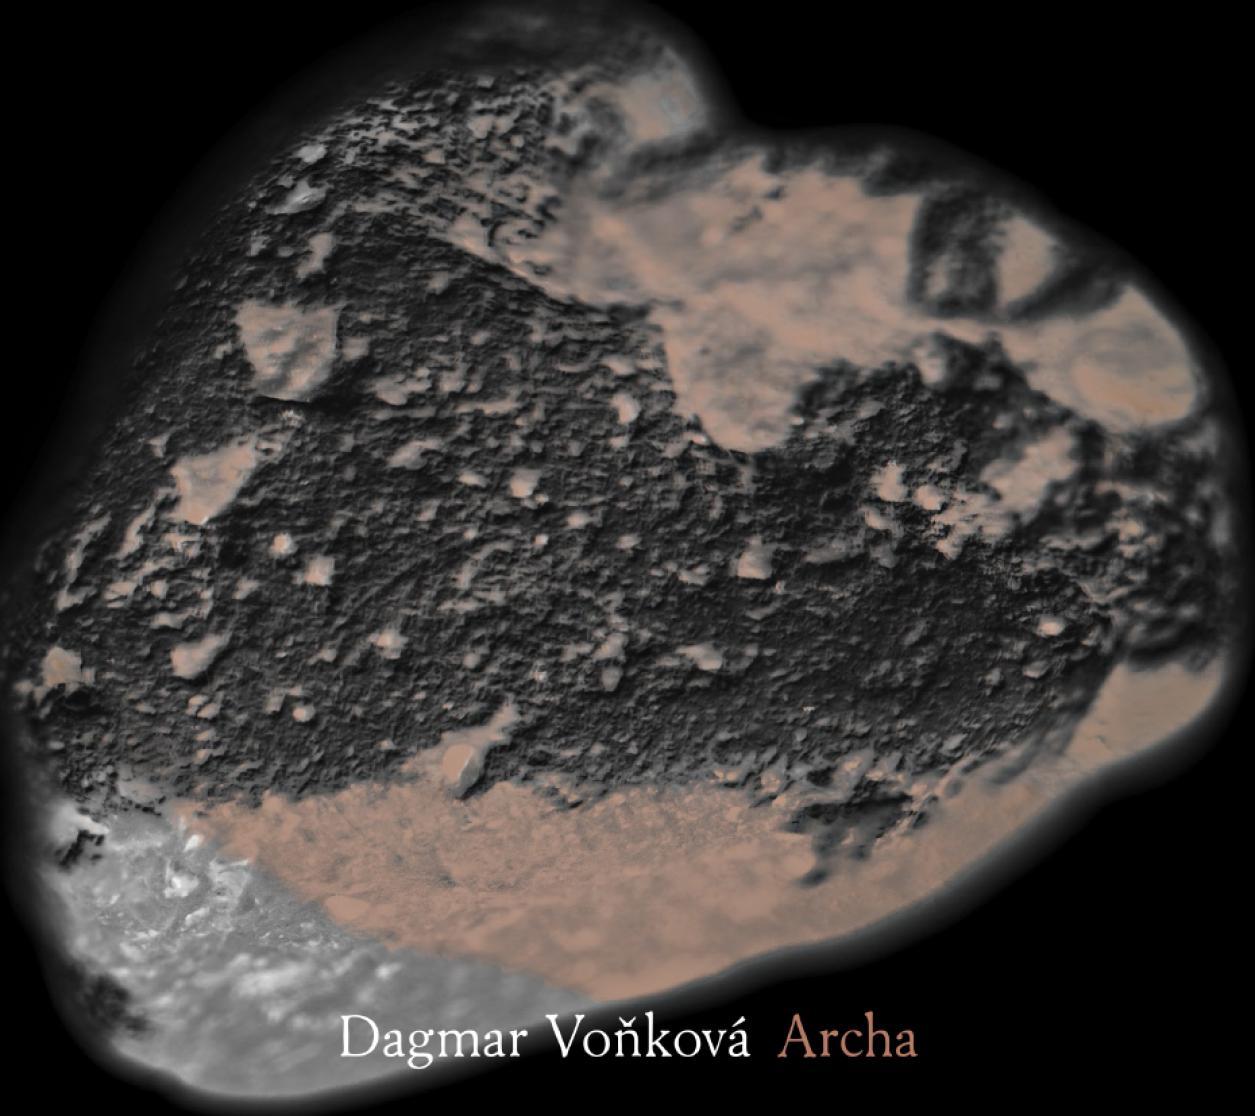 DAGMAR VOŇKOVÁ: Archa